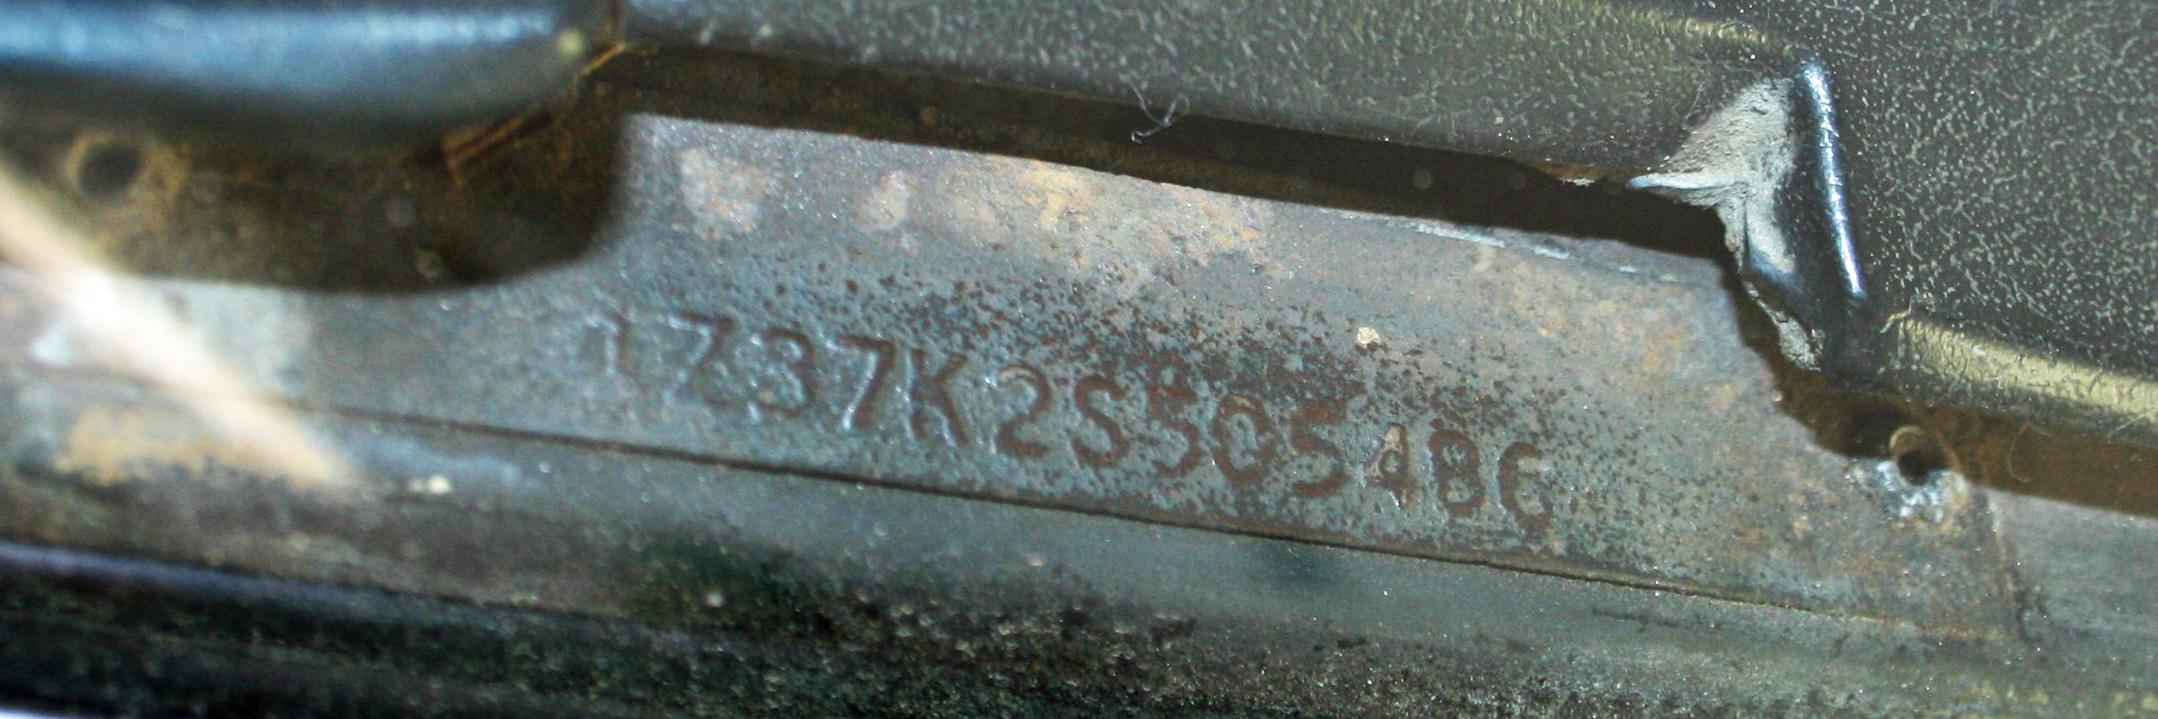 1985 corvette engine number location